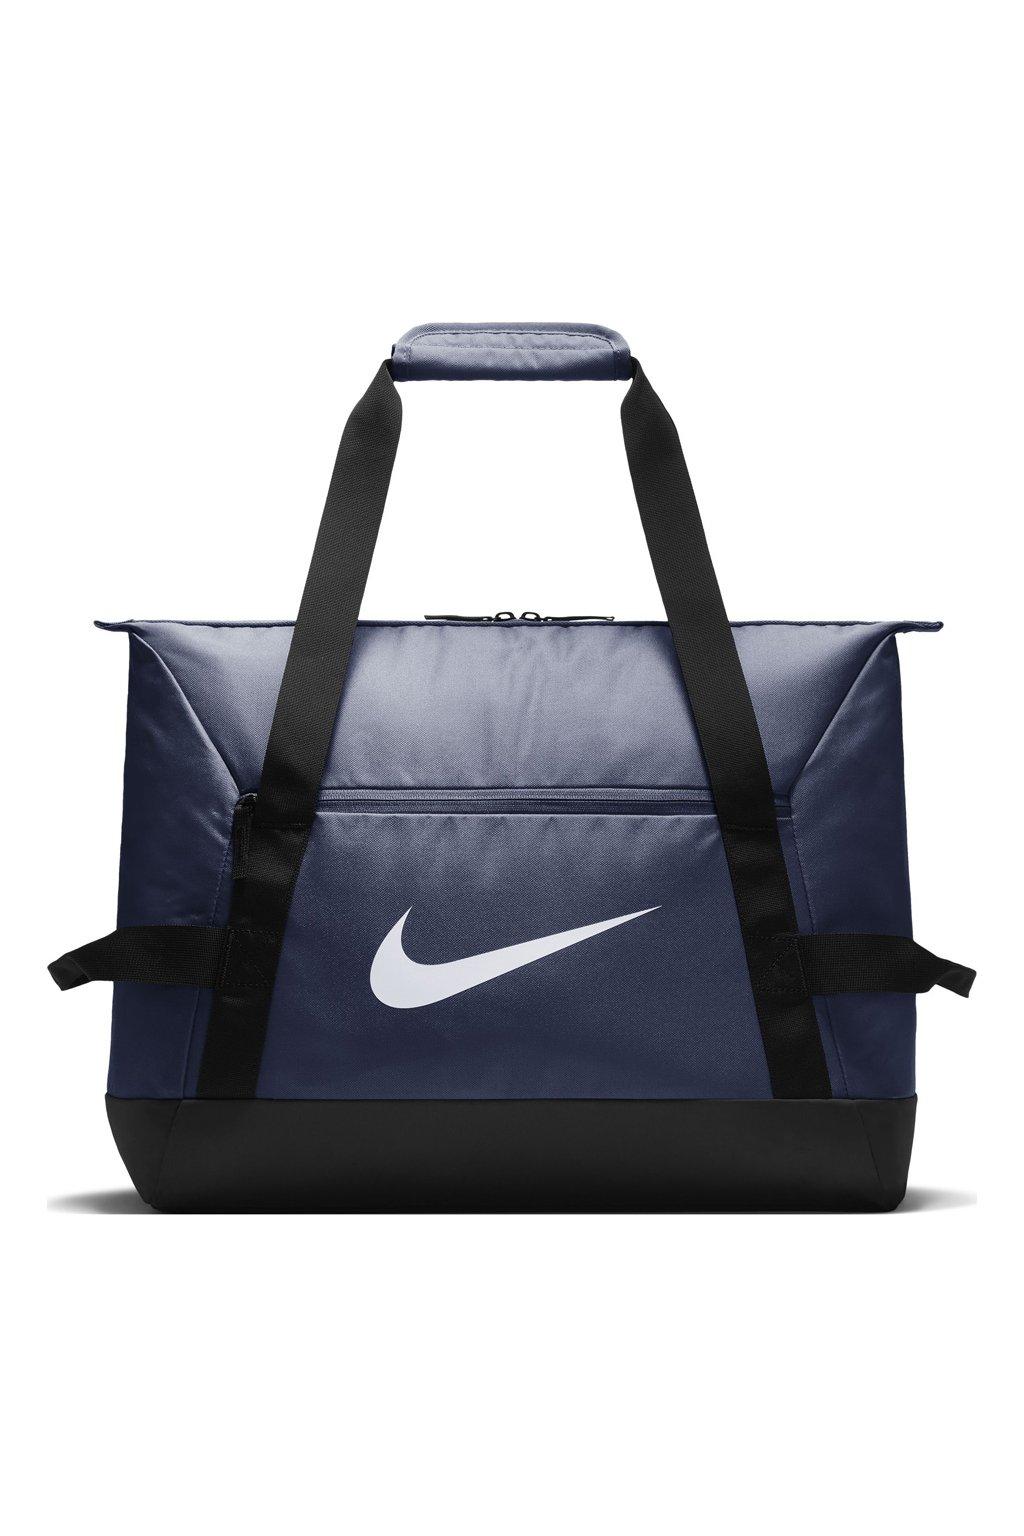 Taška Nike Academy Team S Duffel tmavo modrá BA5505 410